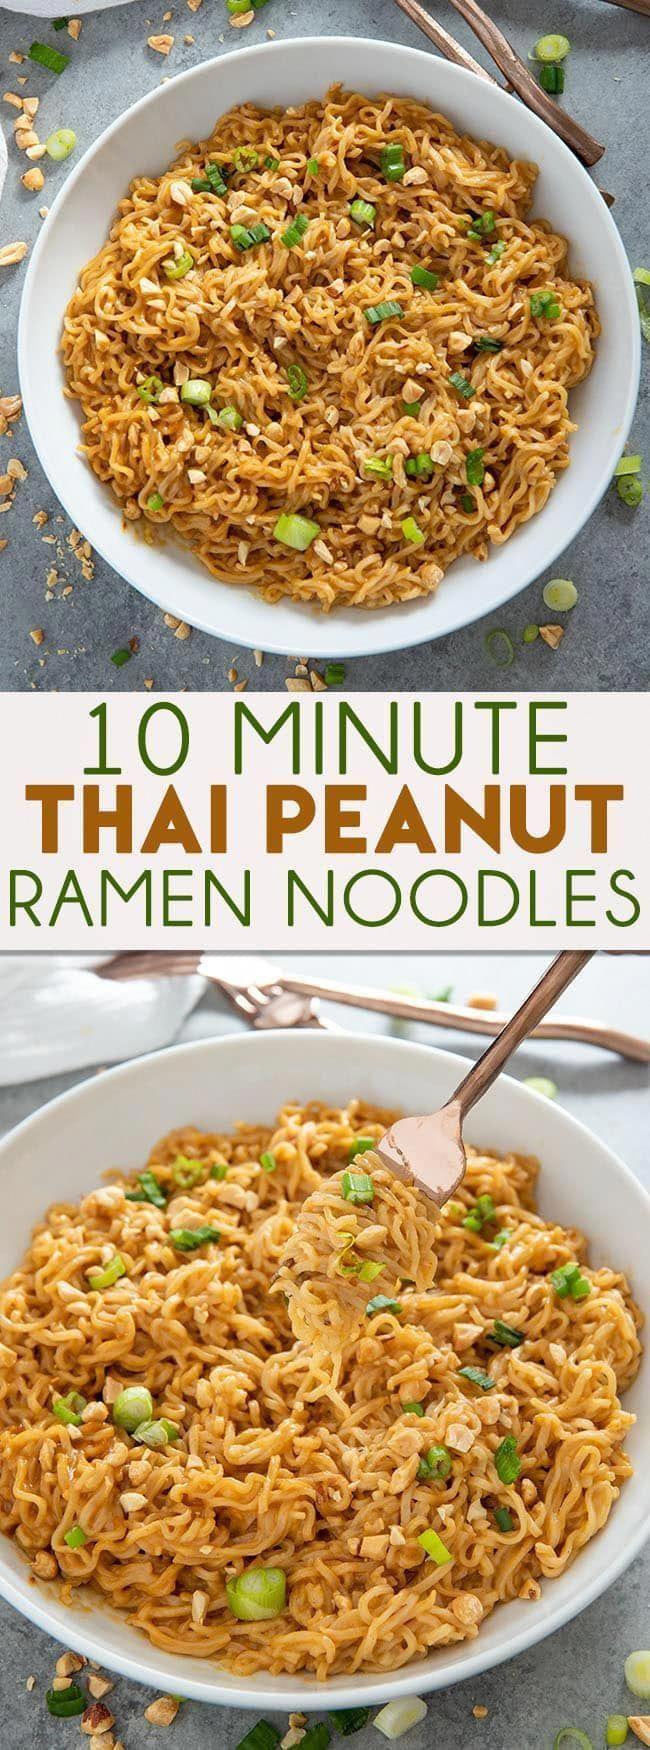 Thai Peanut Ramen Noodles Recipe